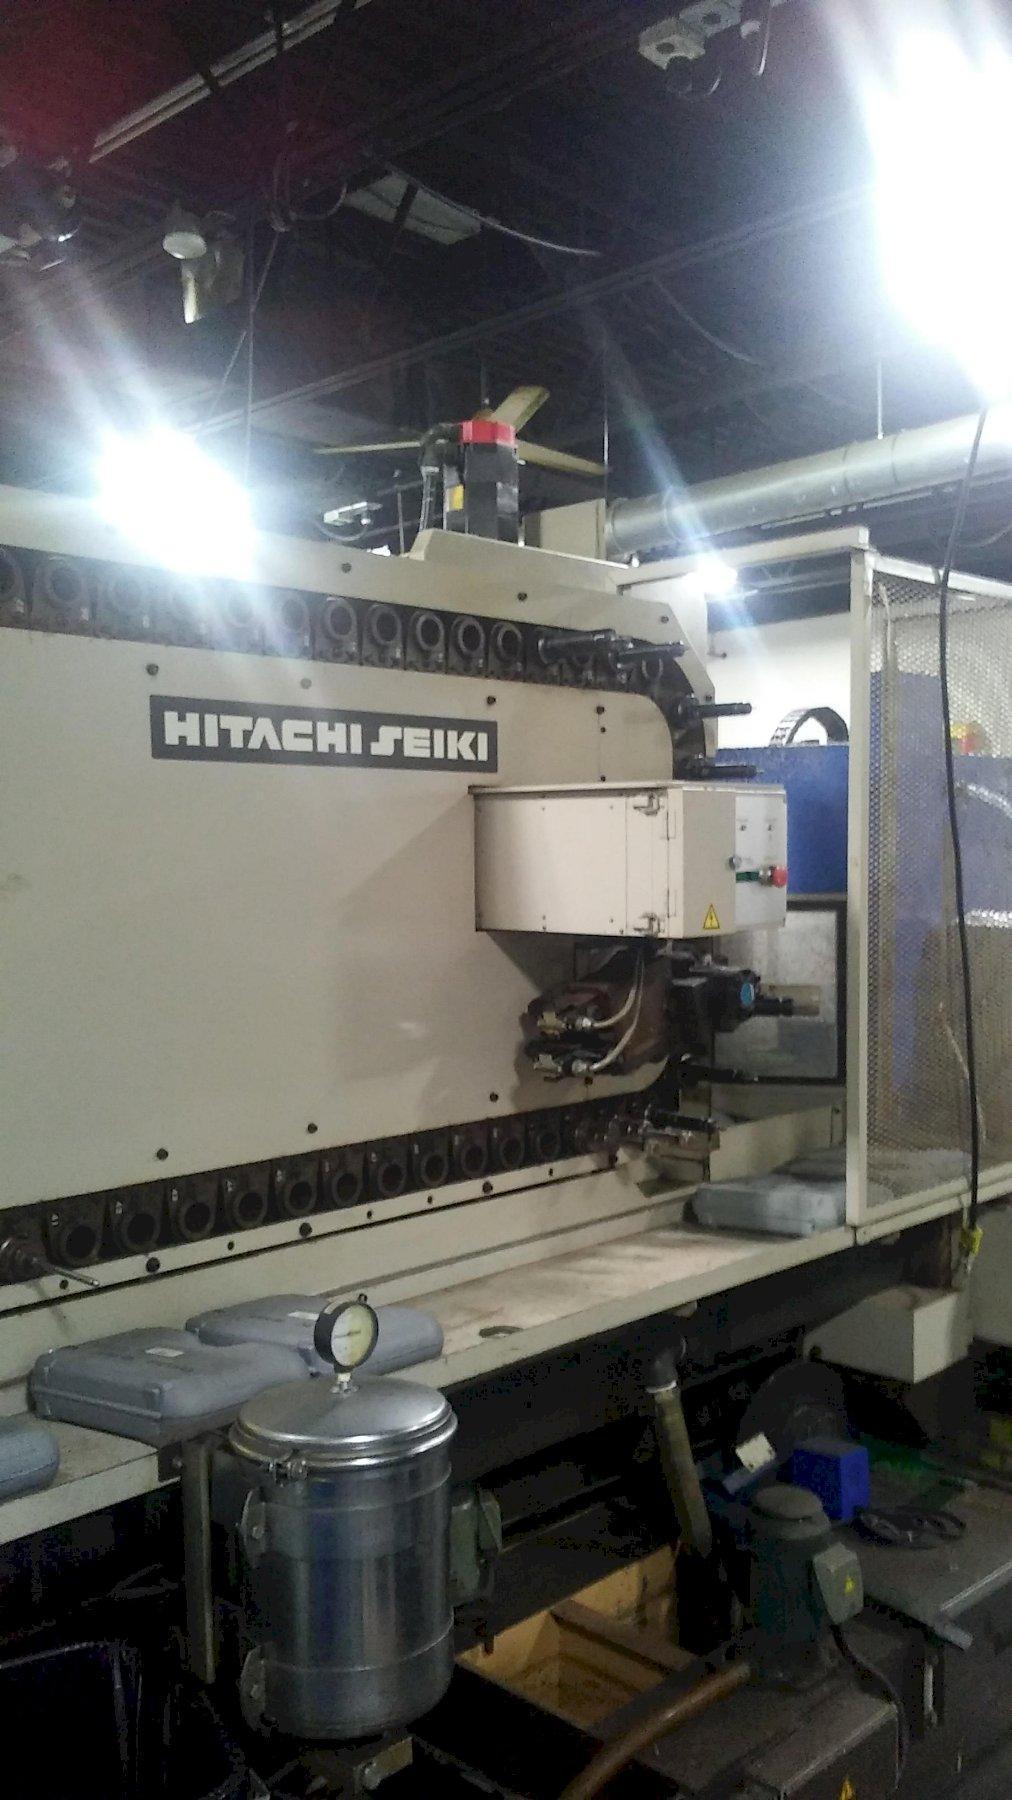 Hitachi Seiki Model HC-400 CNC Horizontal Machining Center, with Fanuc 15M.